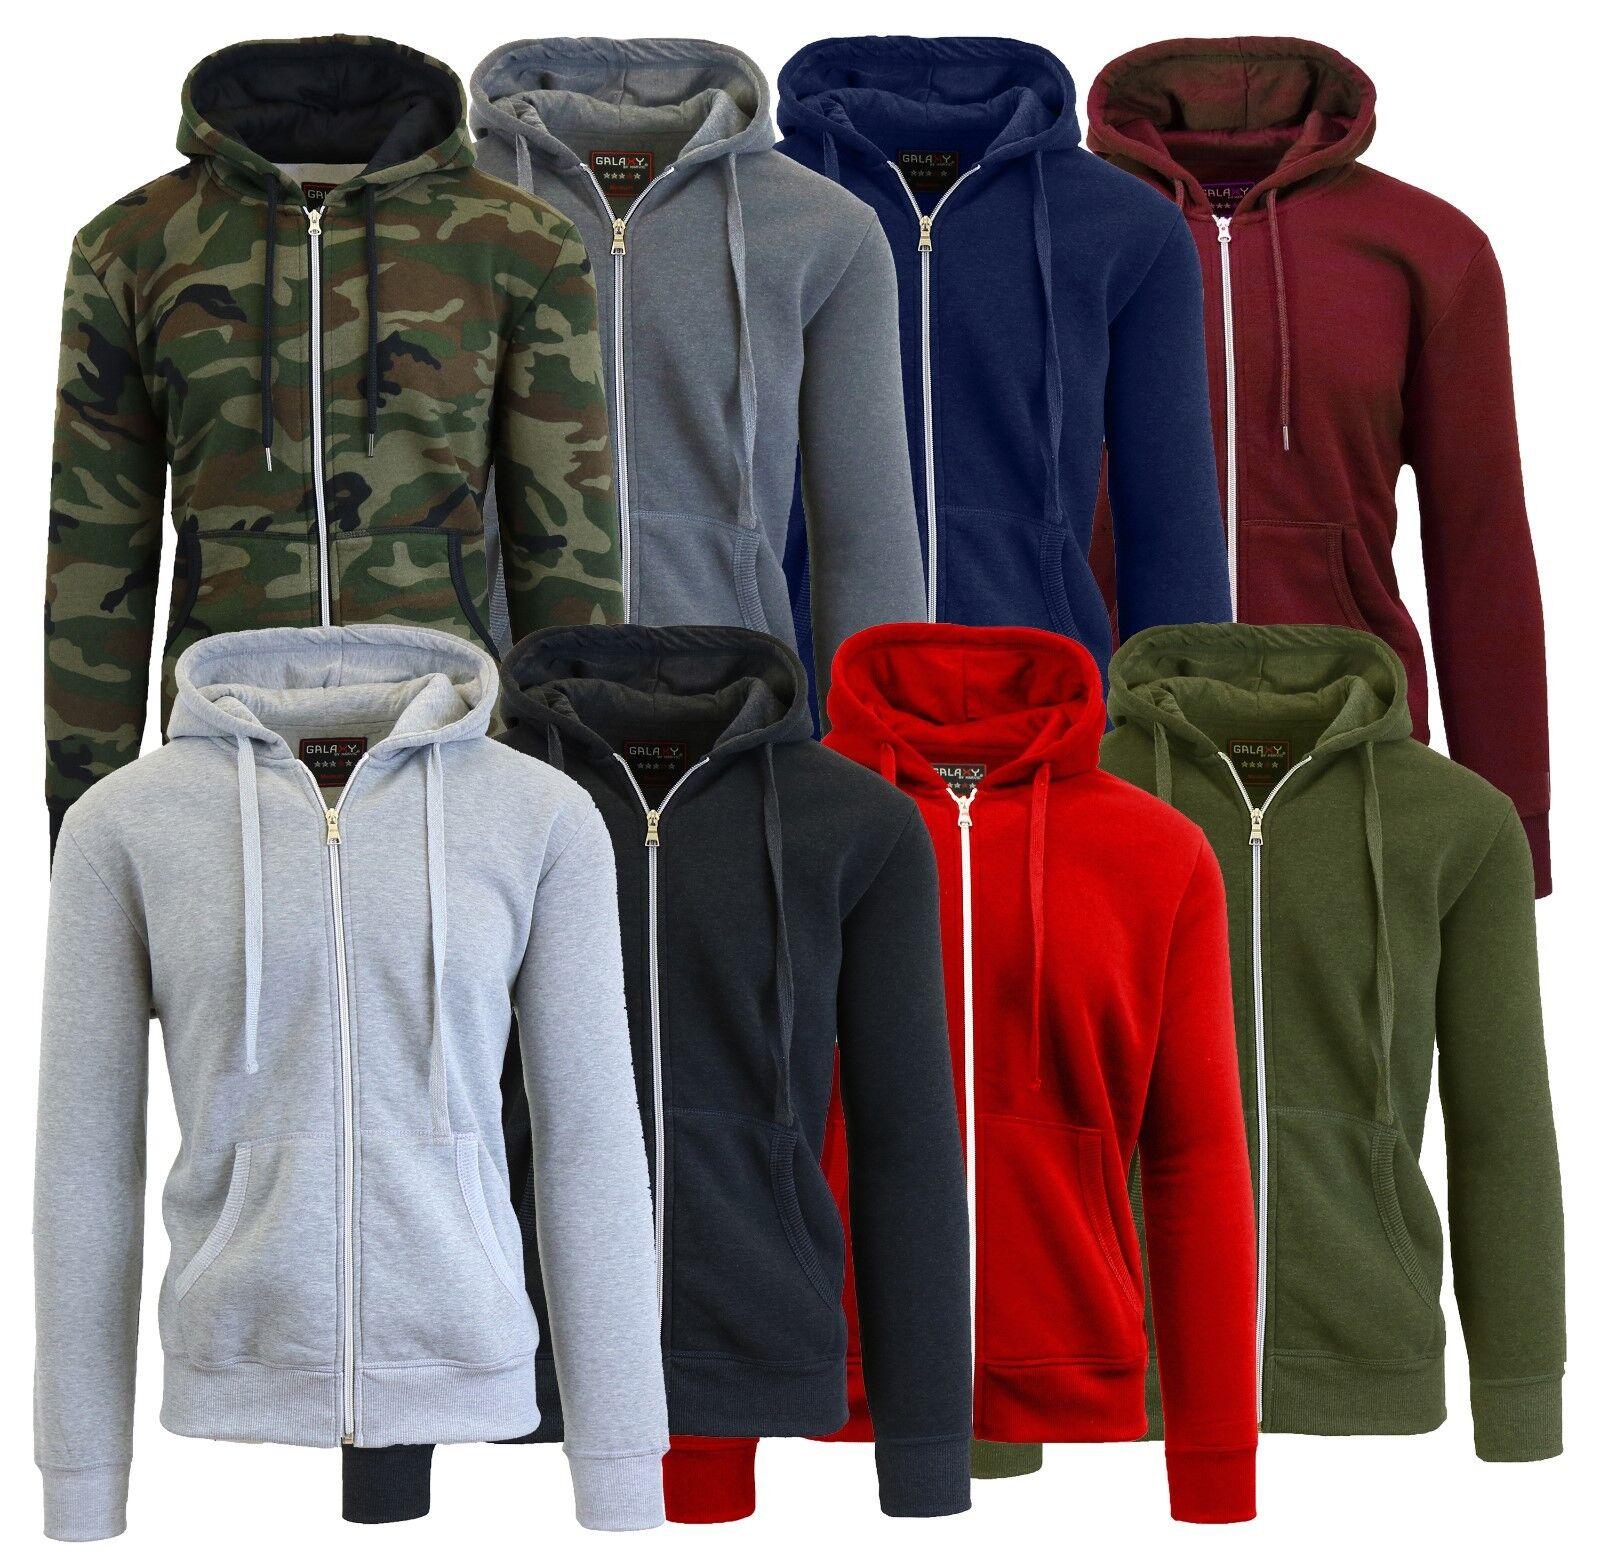 Mens Fleece Hoodie Jacket Sweater For Layering Warm Lounge F